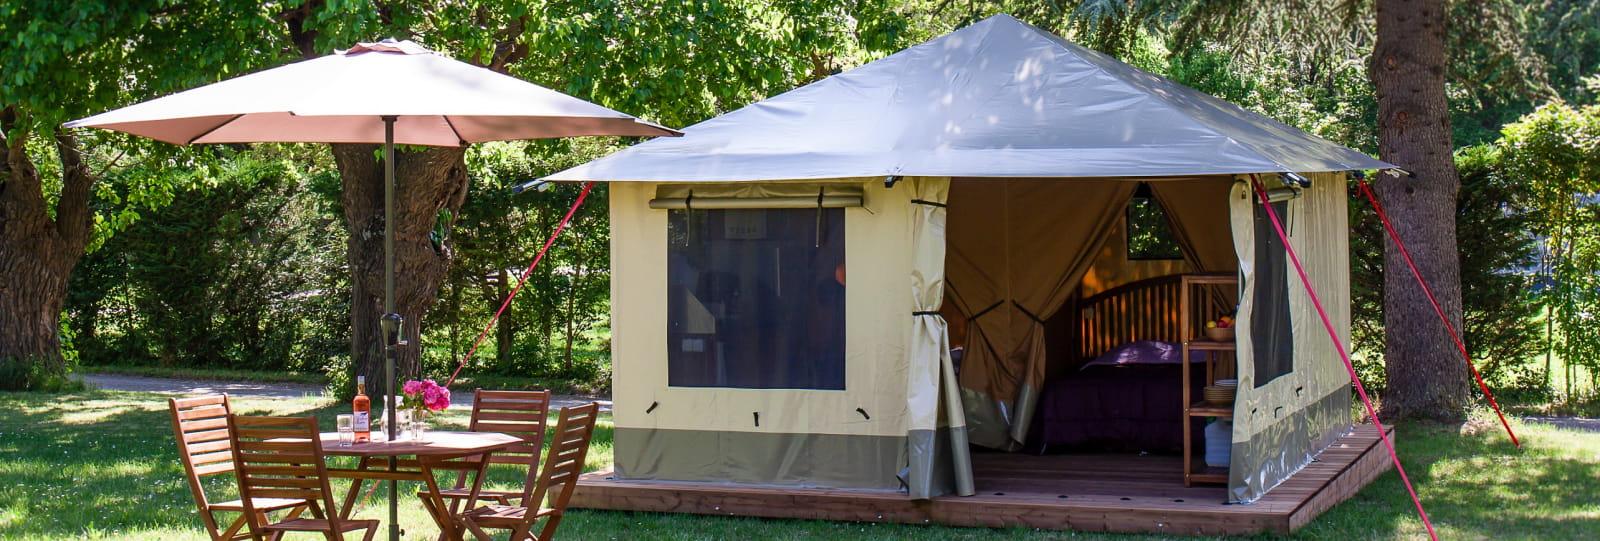 Tente Lodge 'Pitrou' - Camping de la Clairette